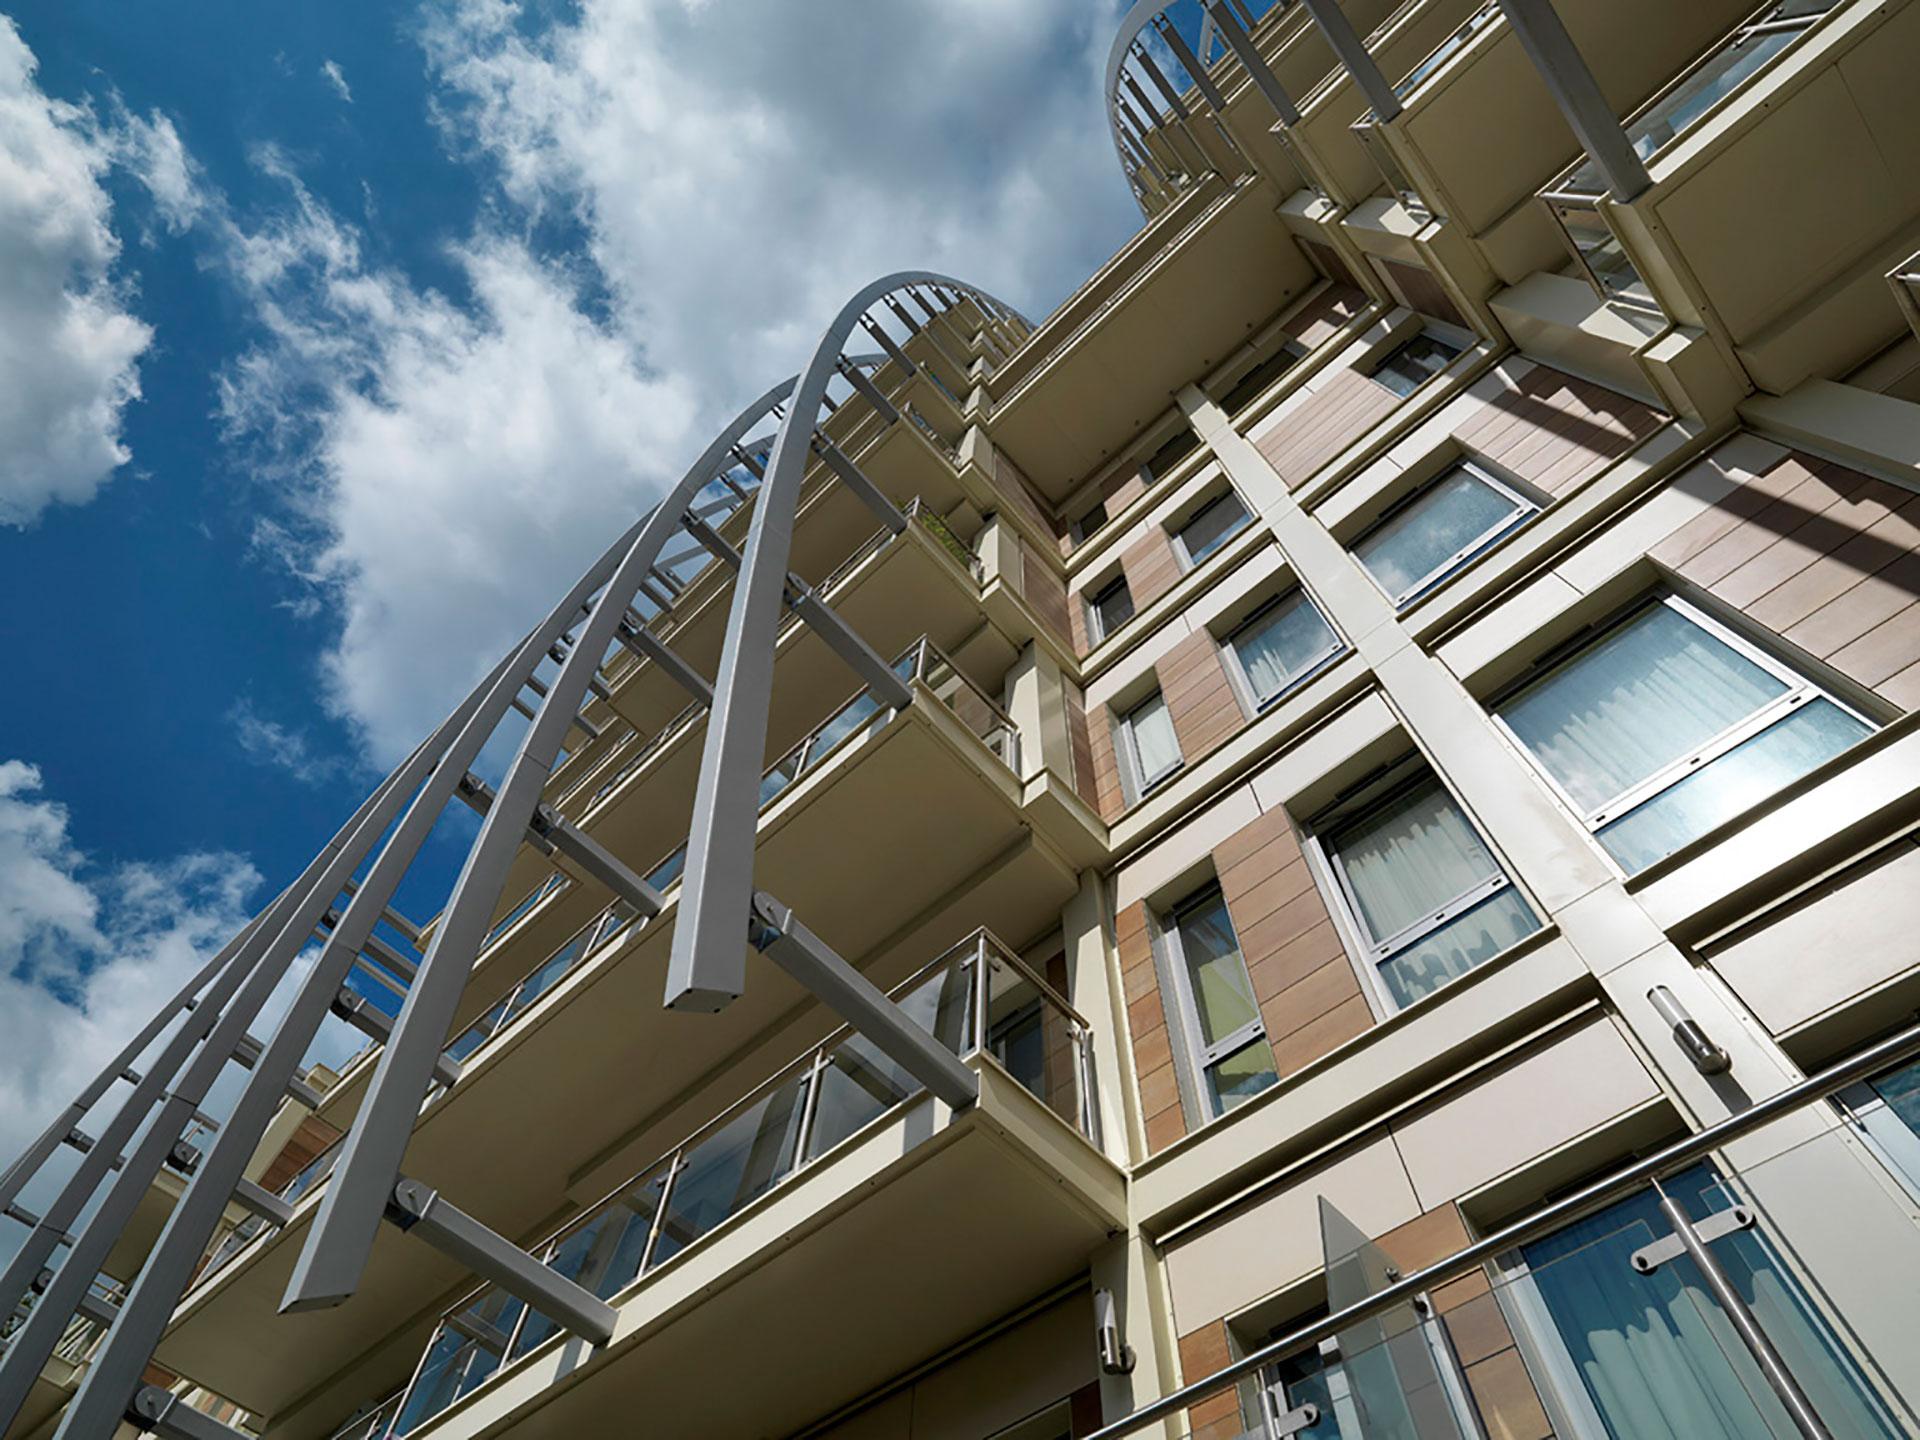 Ariostea: cladding for outdoor surfaces and ventilated façades